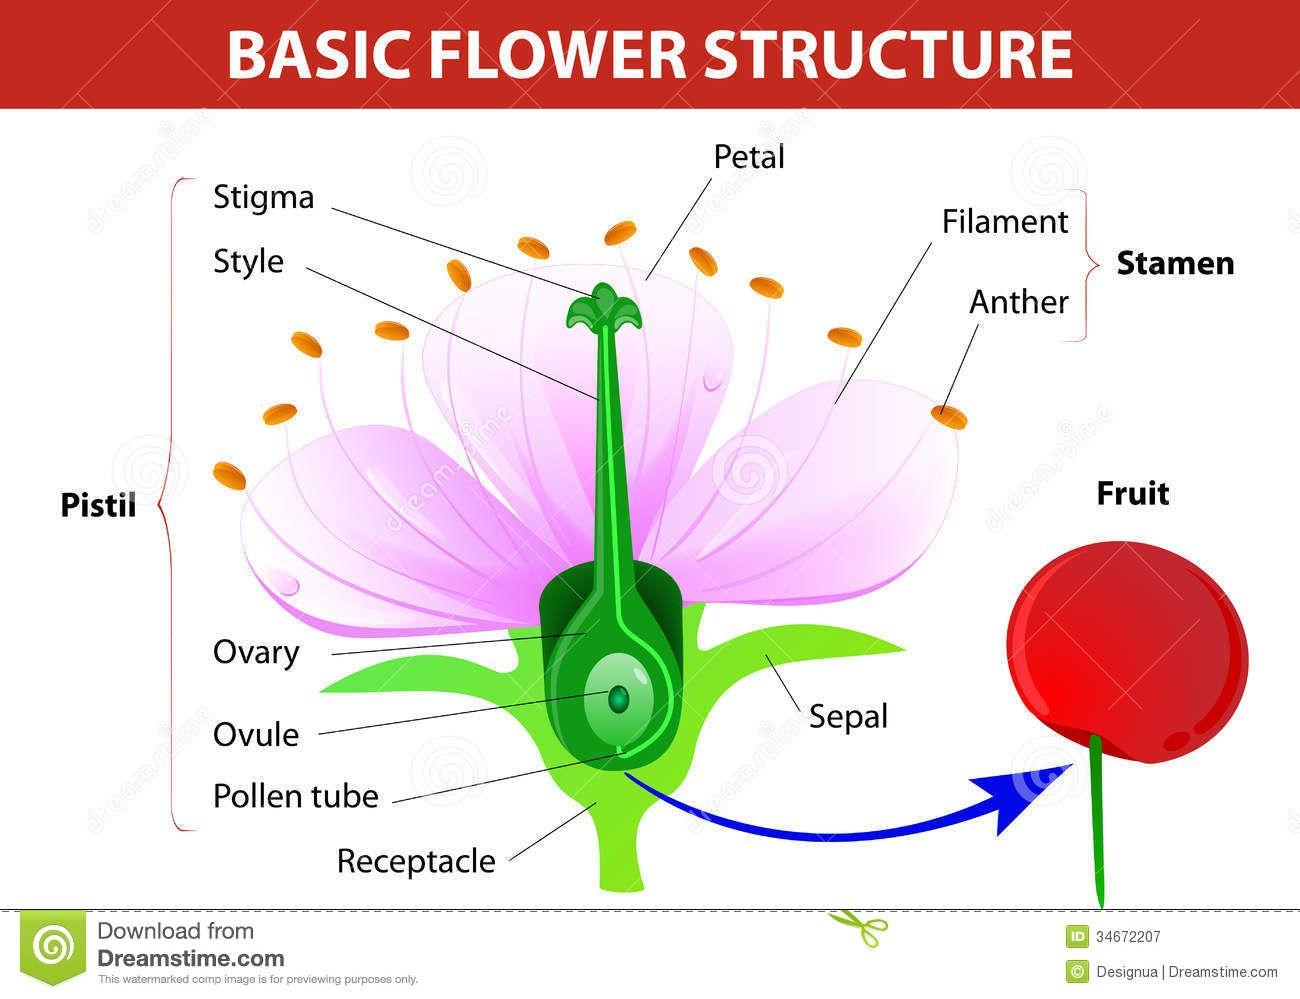 Pin by Aerobe on Flower & plants | Pinterest | Botany